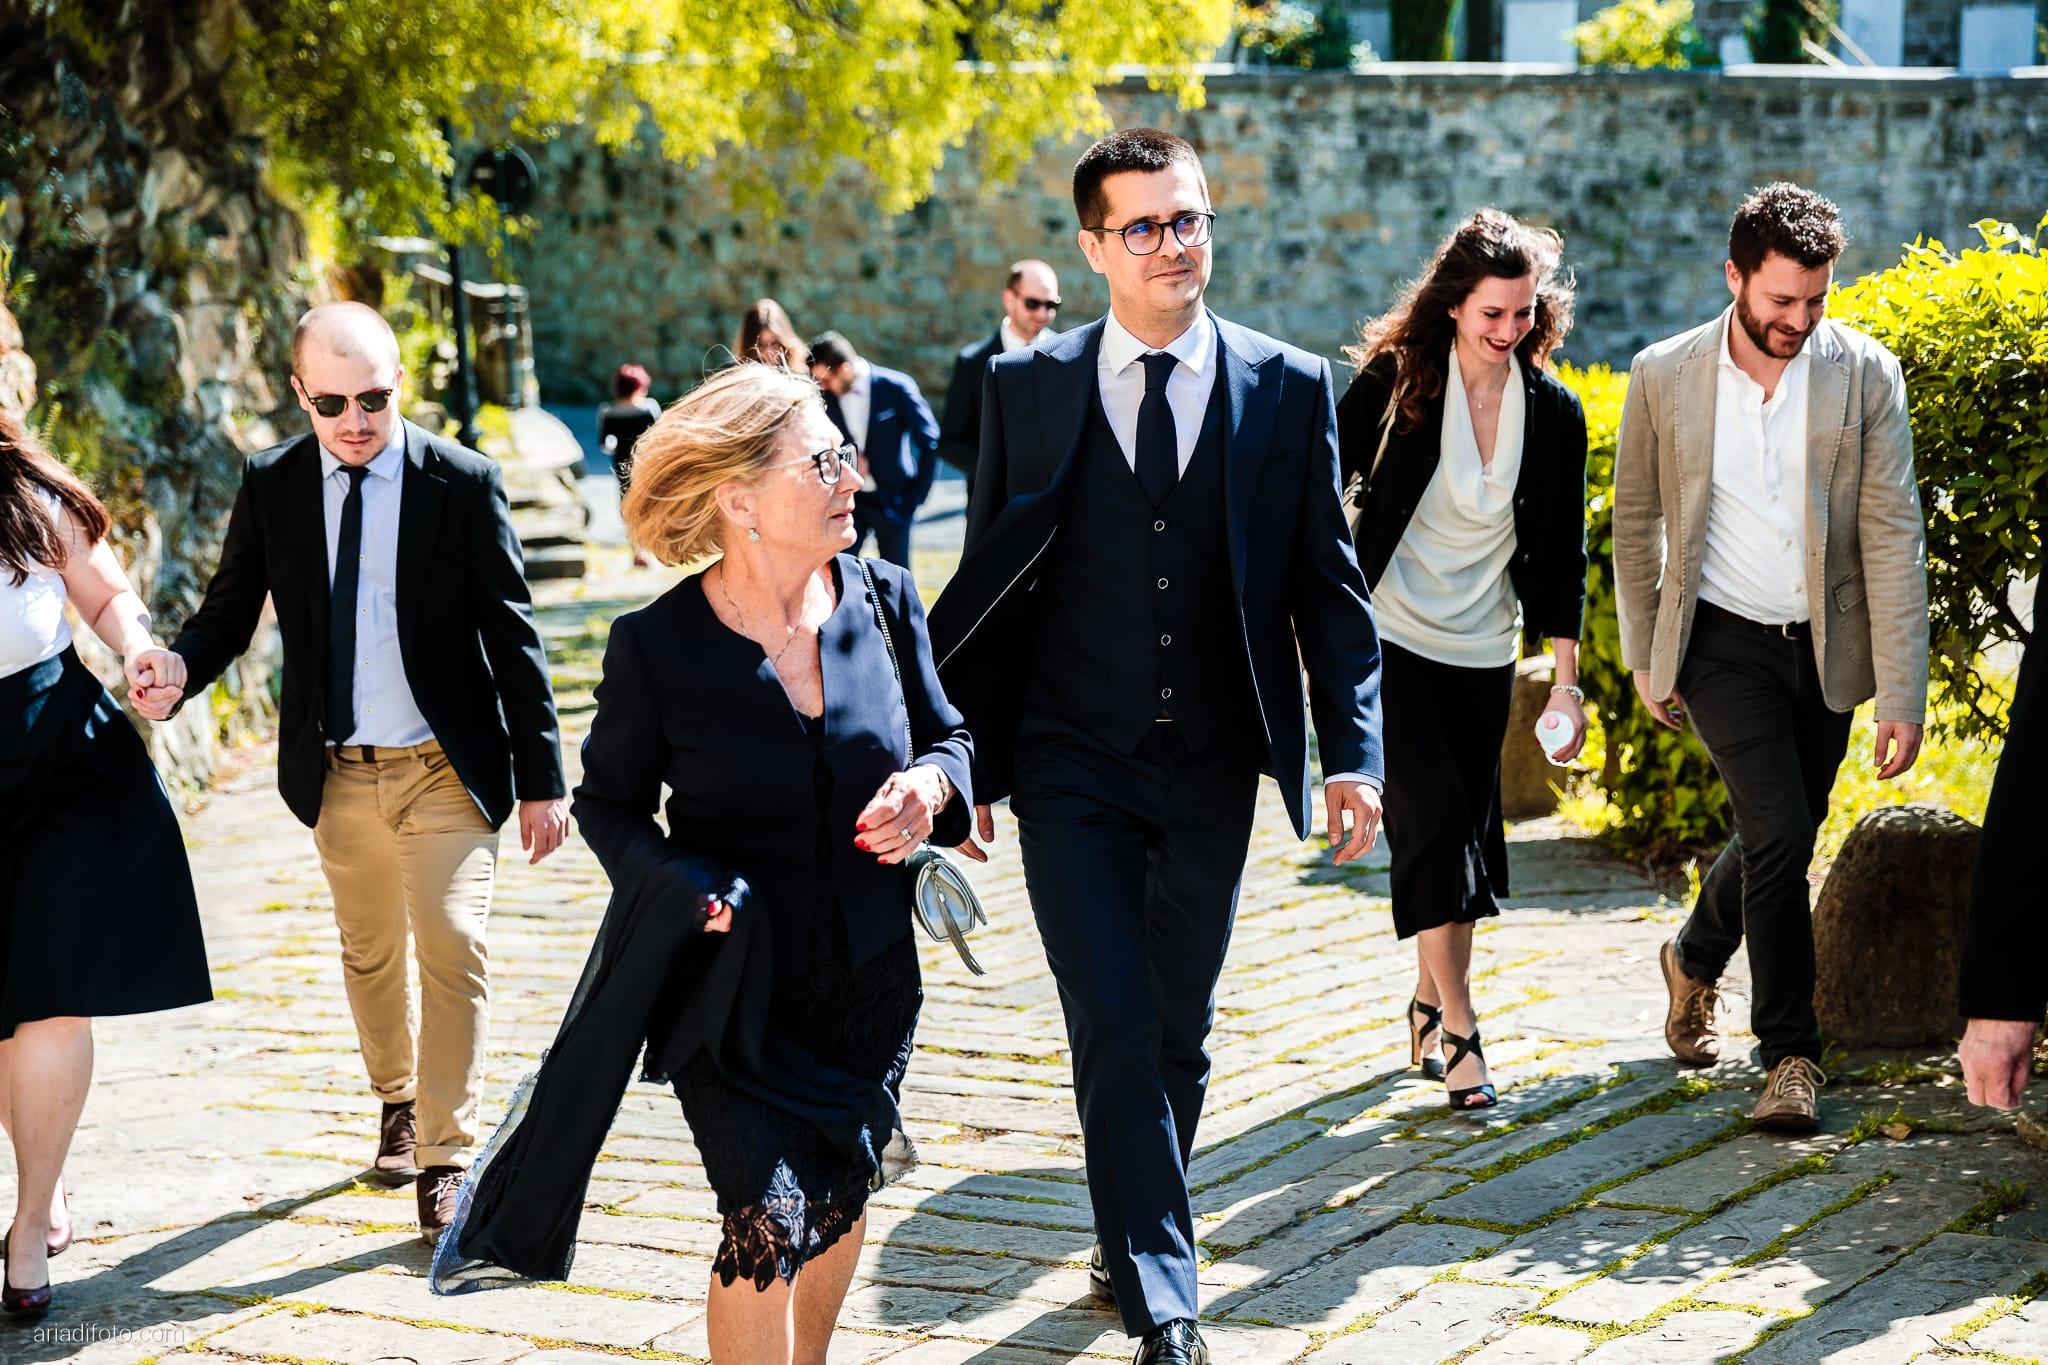 Marina Stefano Matrimonio Castello San Giusto Molo IV Trieste cerimonia civile ingresso sposo